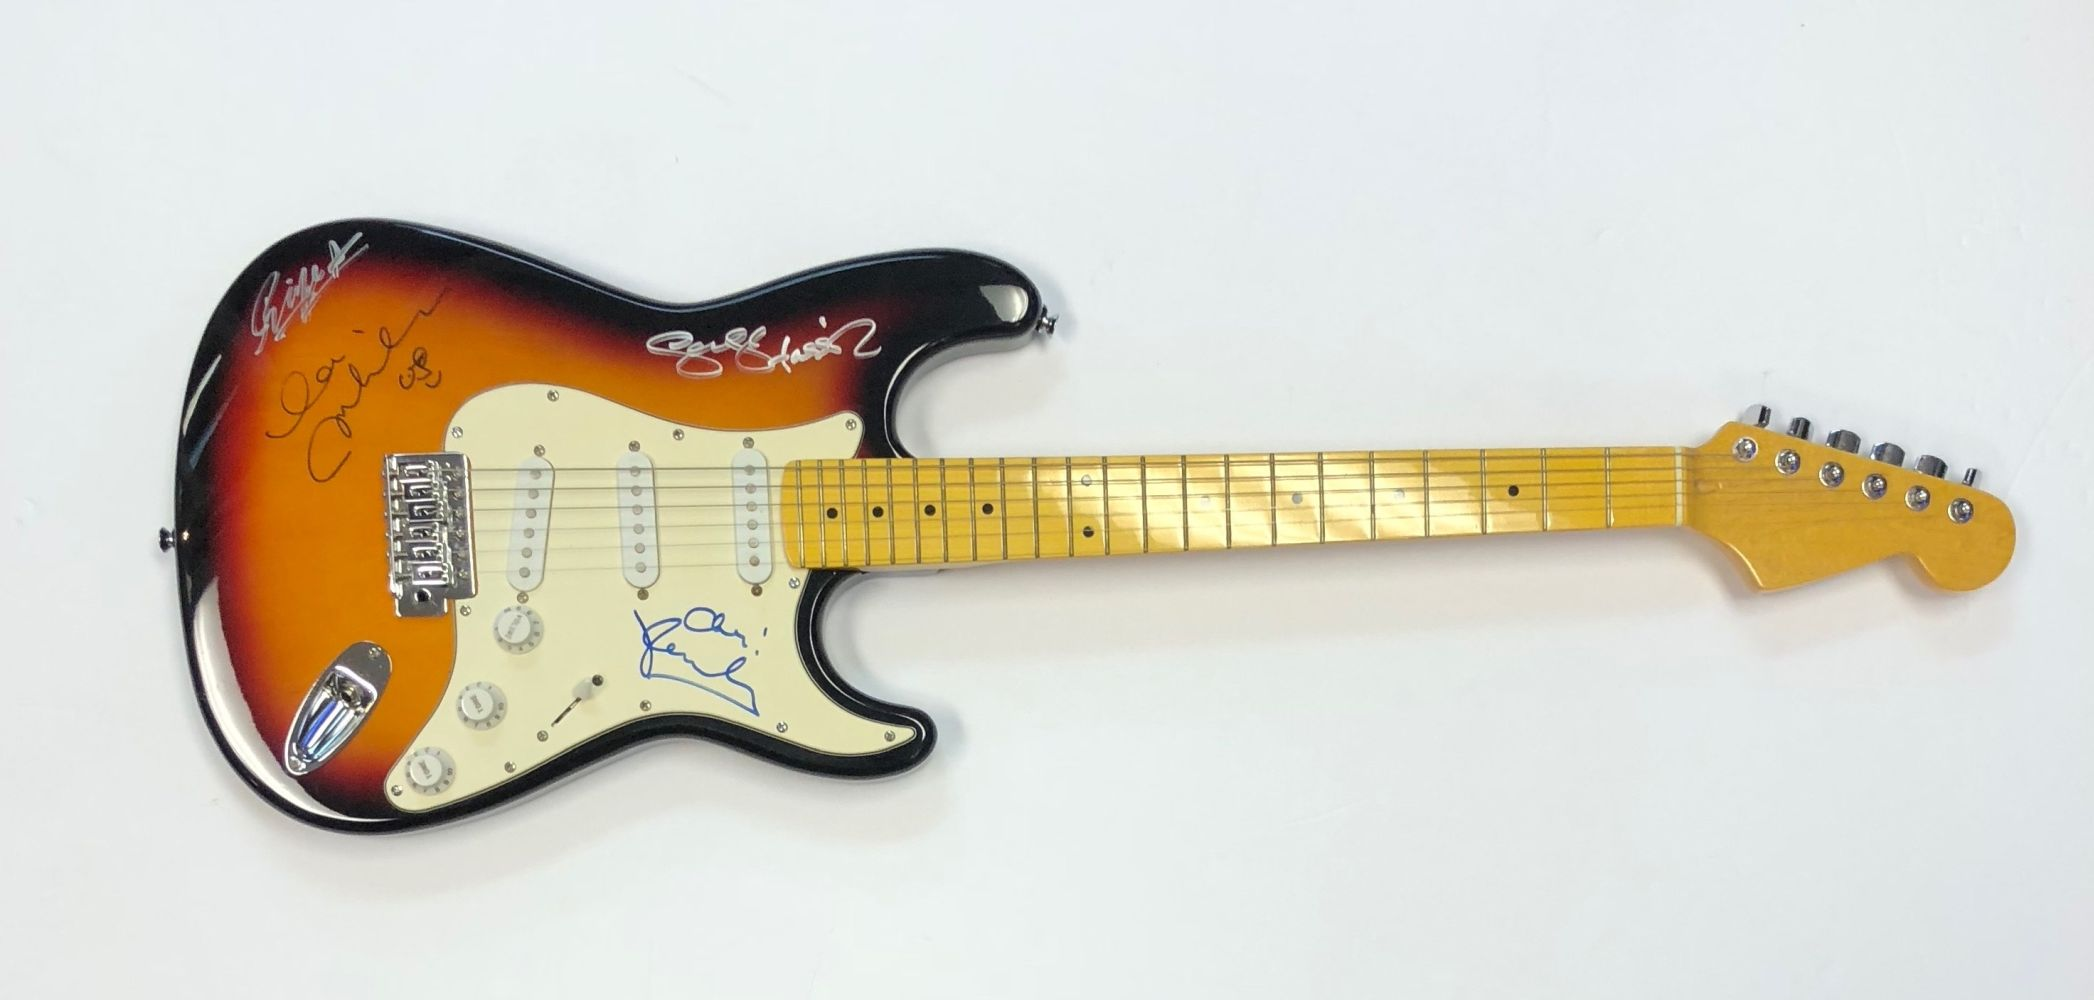 Lot 277a - The Beatles Signed Sunburst Guitar